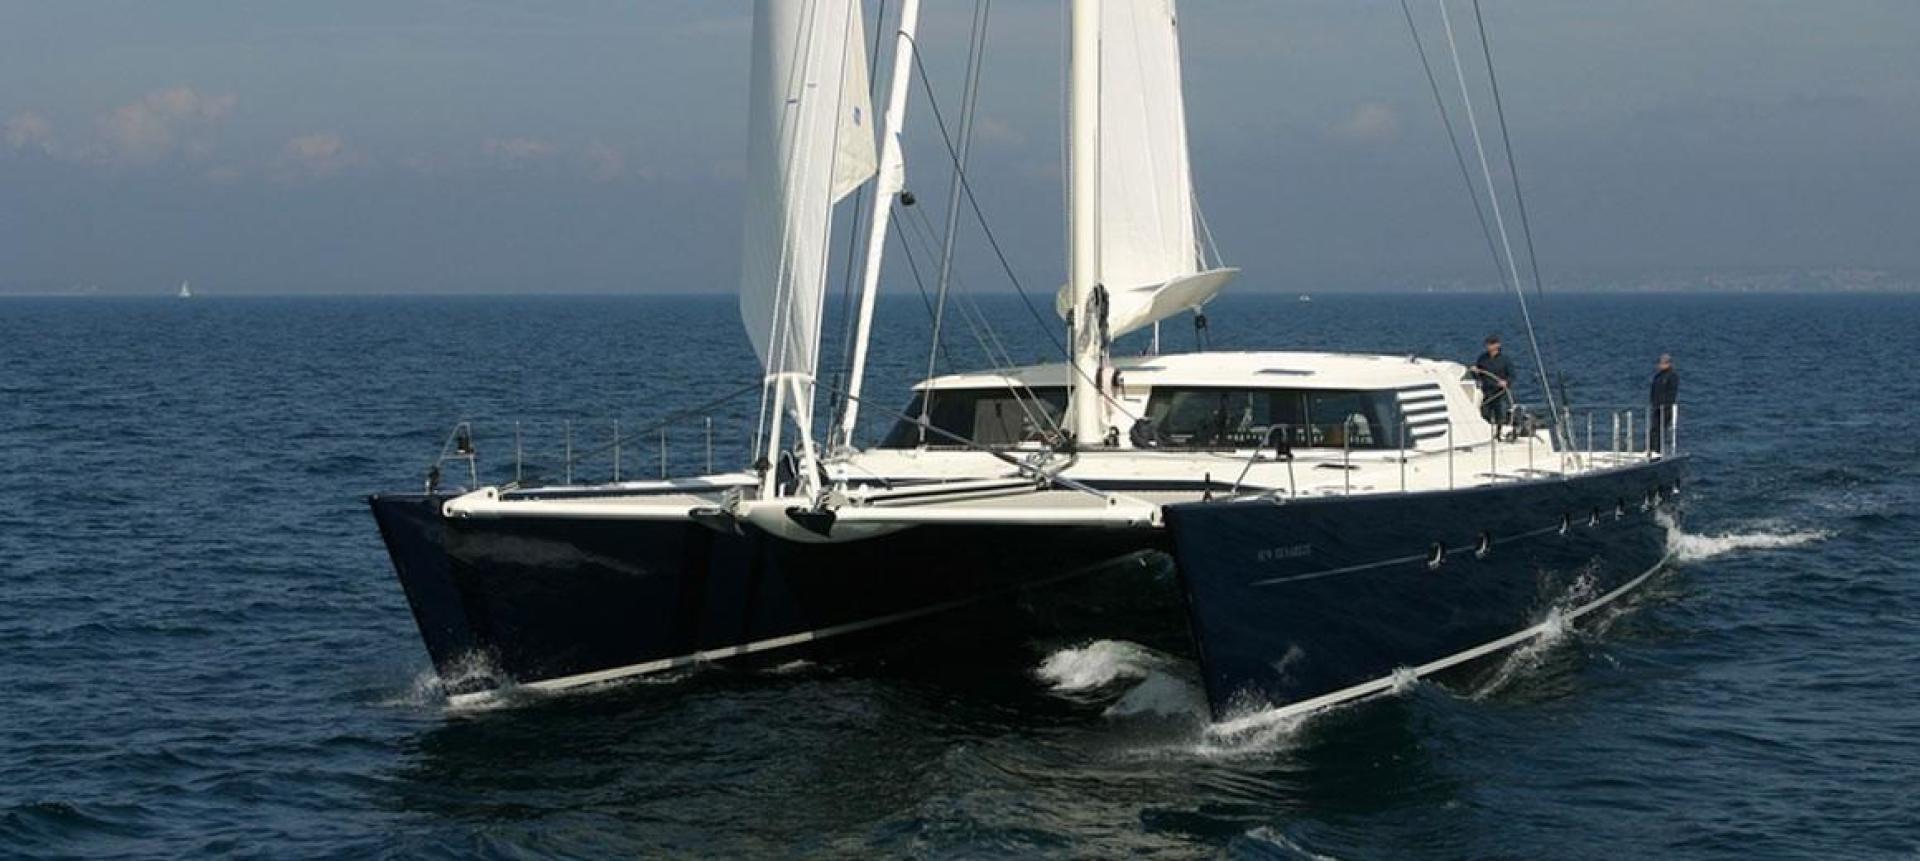 JFA-Catamaran 2004-Azizam Miami-Florida-United States-1367446 | Thumbnail